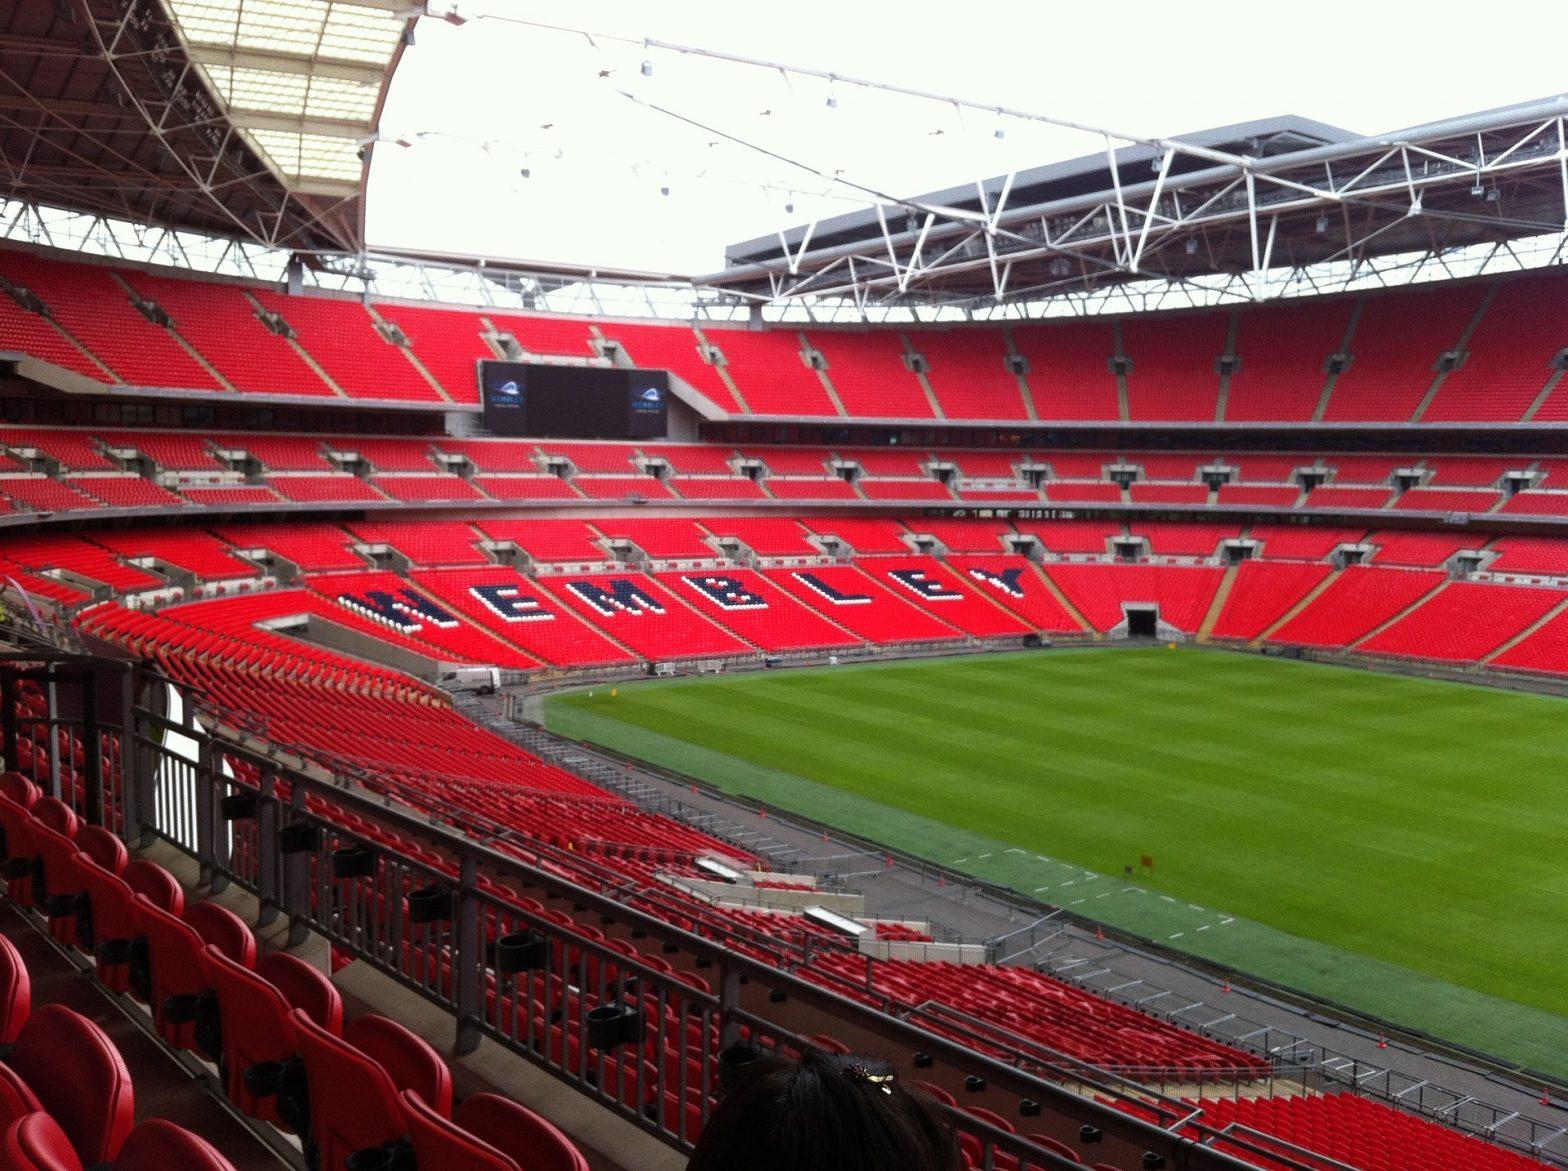 https://pixabay.com/de/stadion-wembley-london-703932/